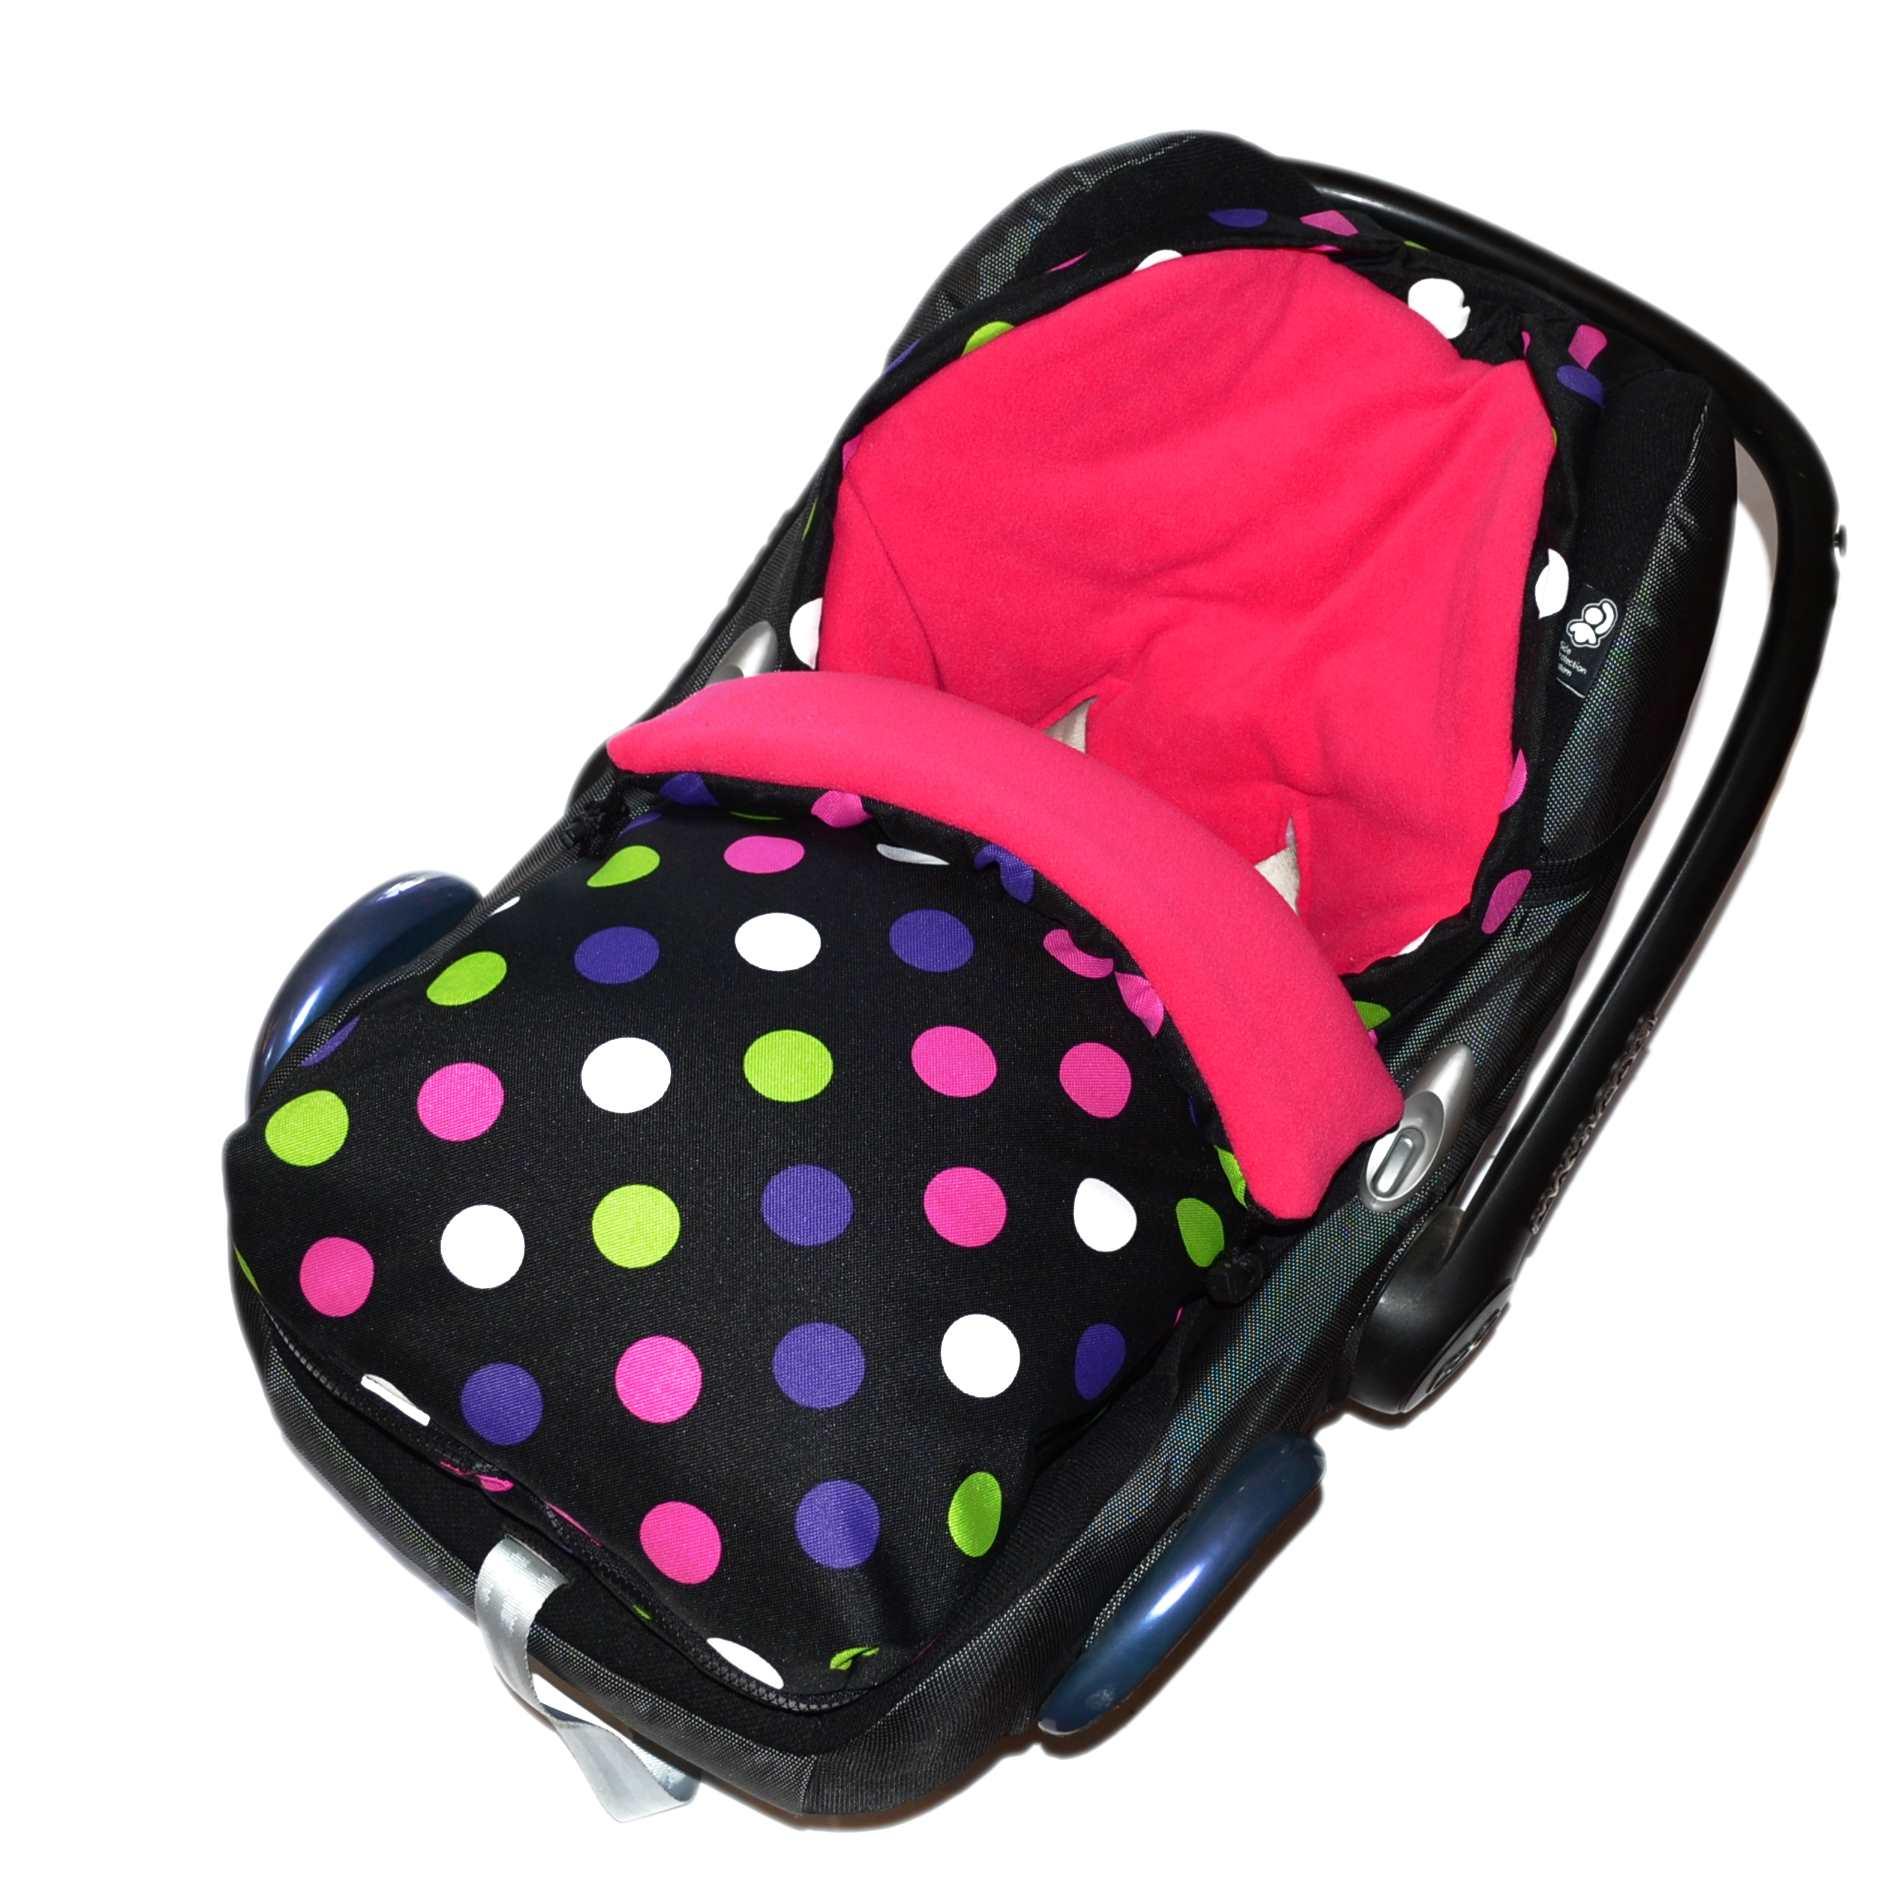 Fusak do autosedačky nebo korbičky - růžový fleece/barevné puntíky na černé